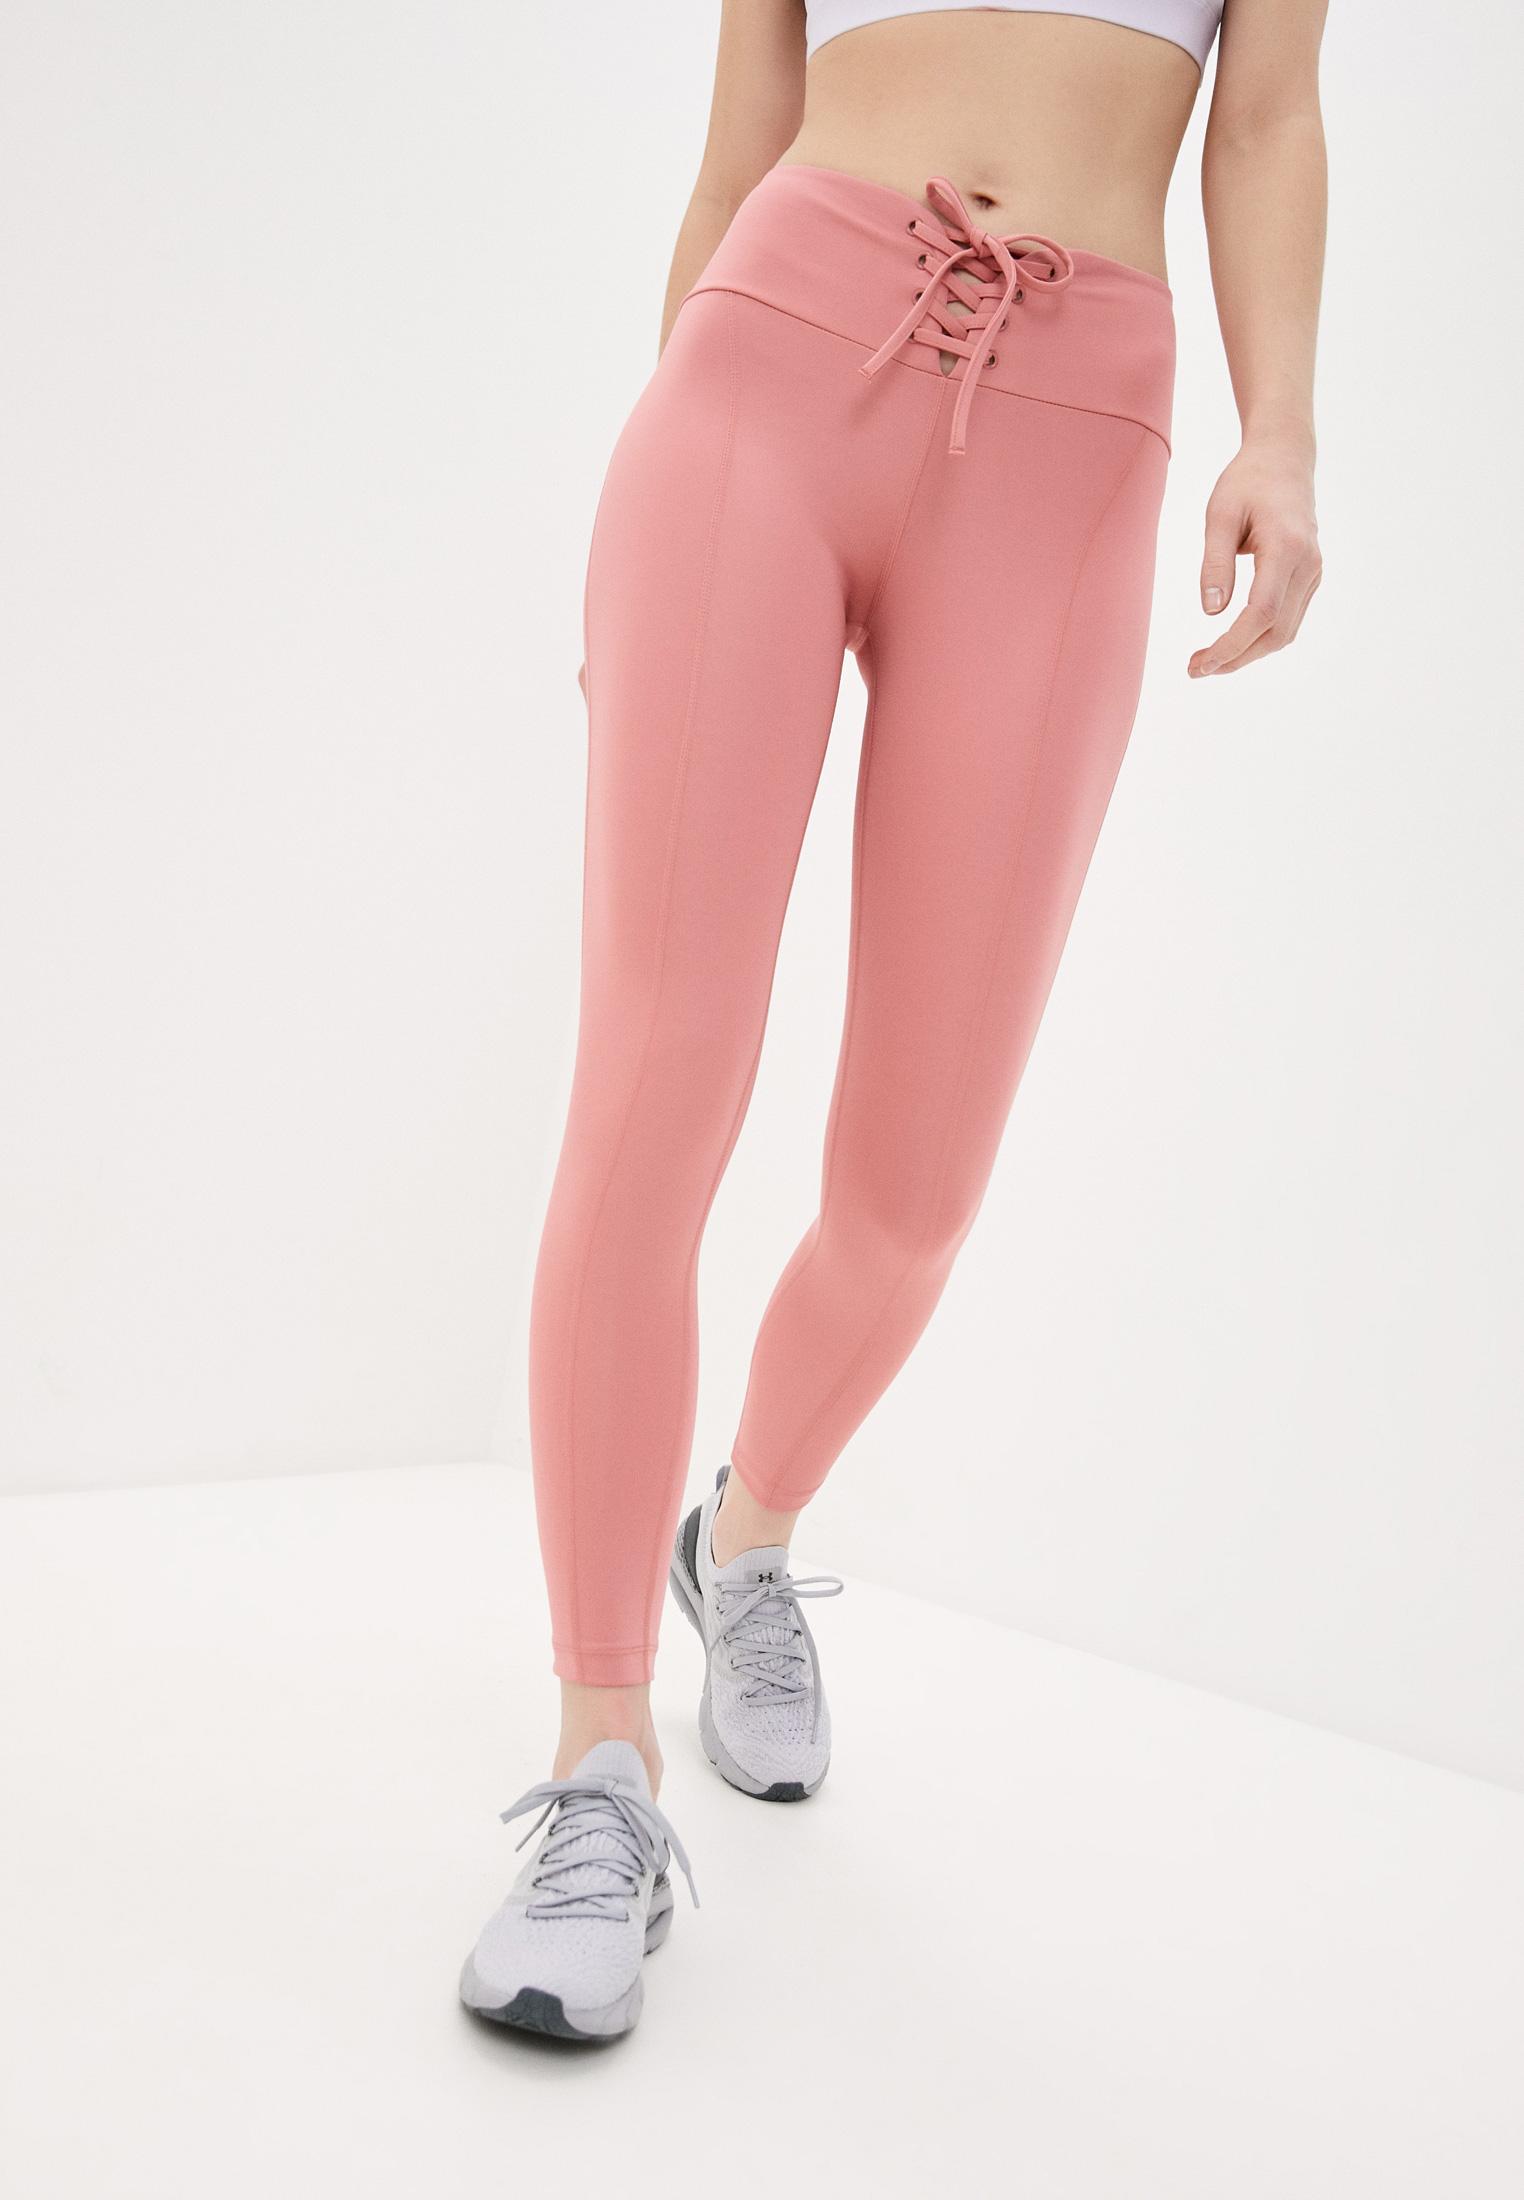 Женские леггинсы Guess Jeans Леггинсы Guess Jeans